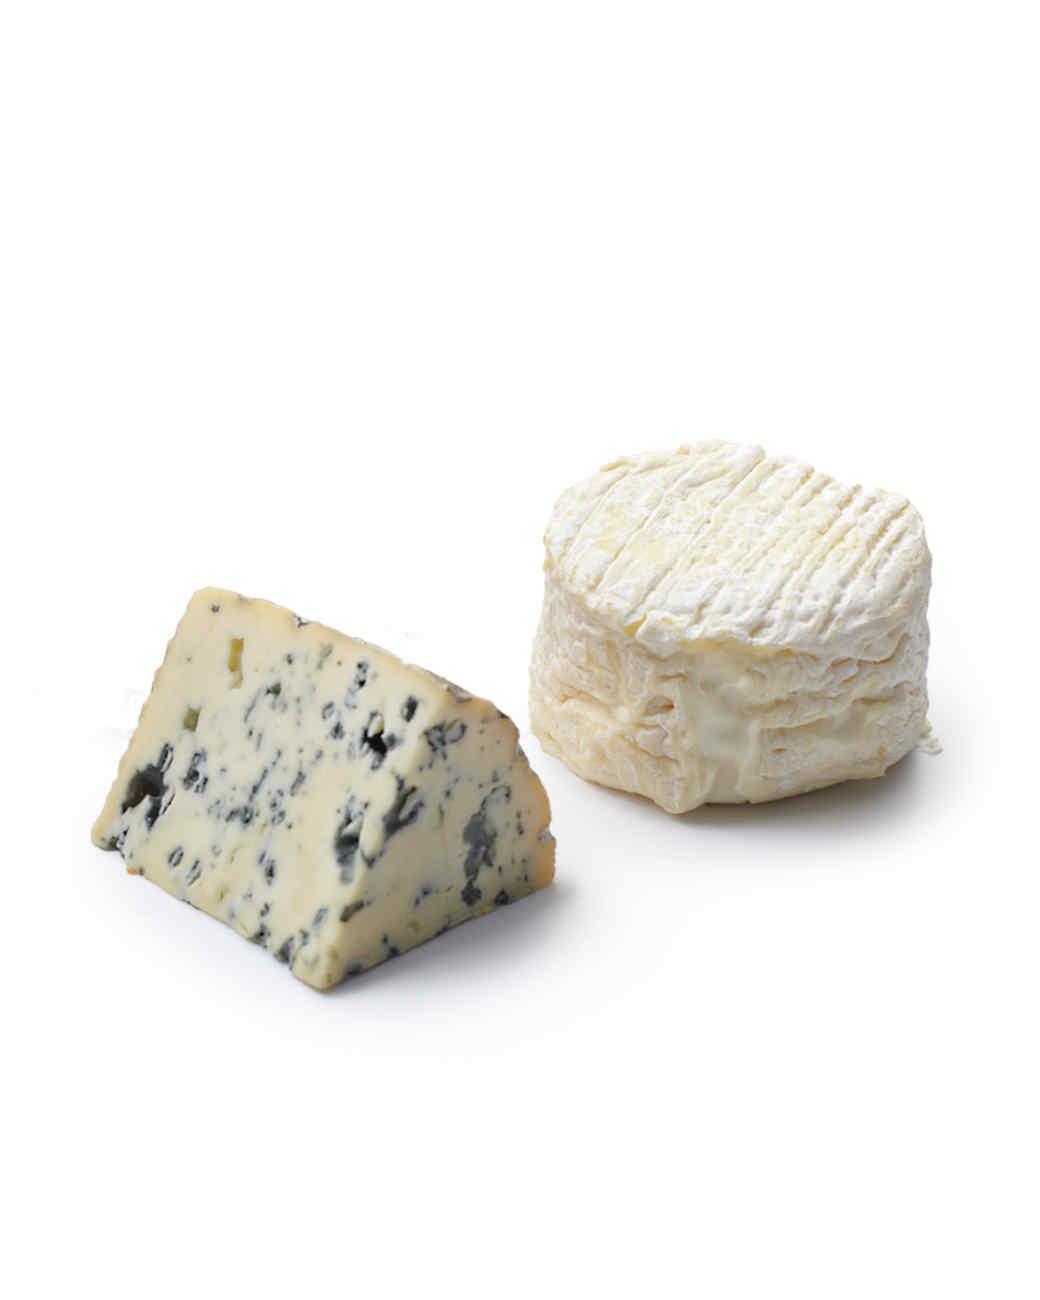 easy-entertaining-cheese-plate-mld108950.jpg